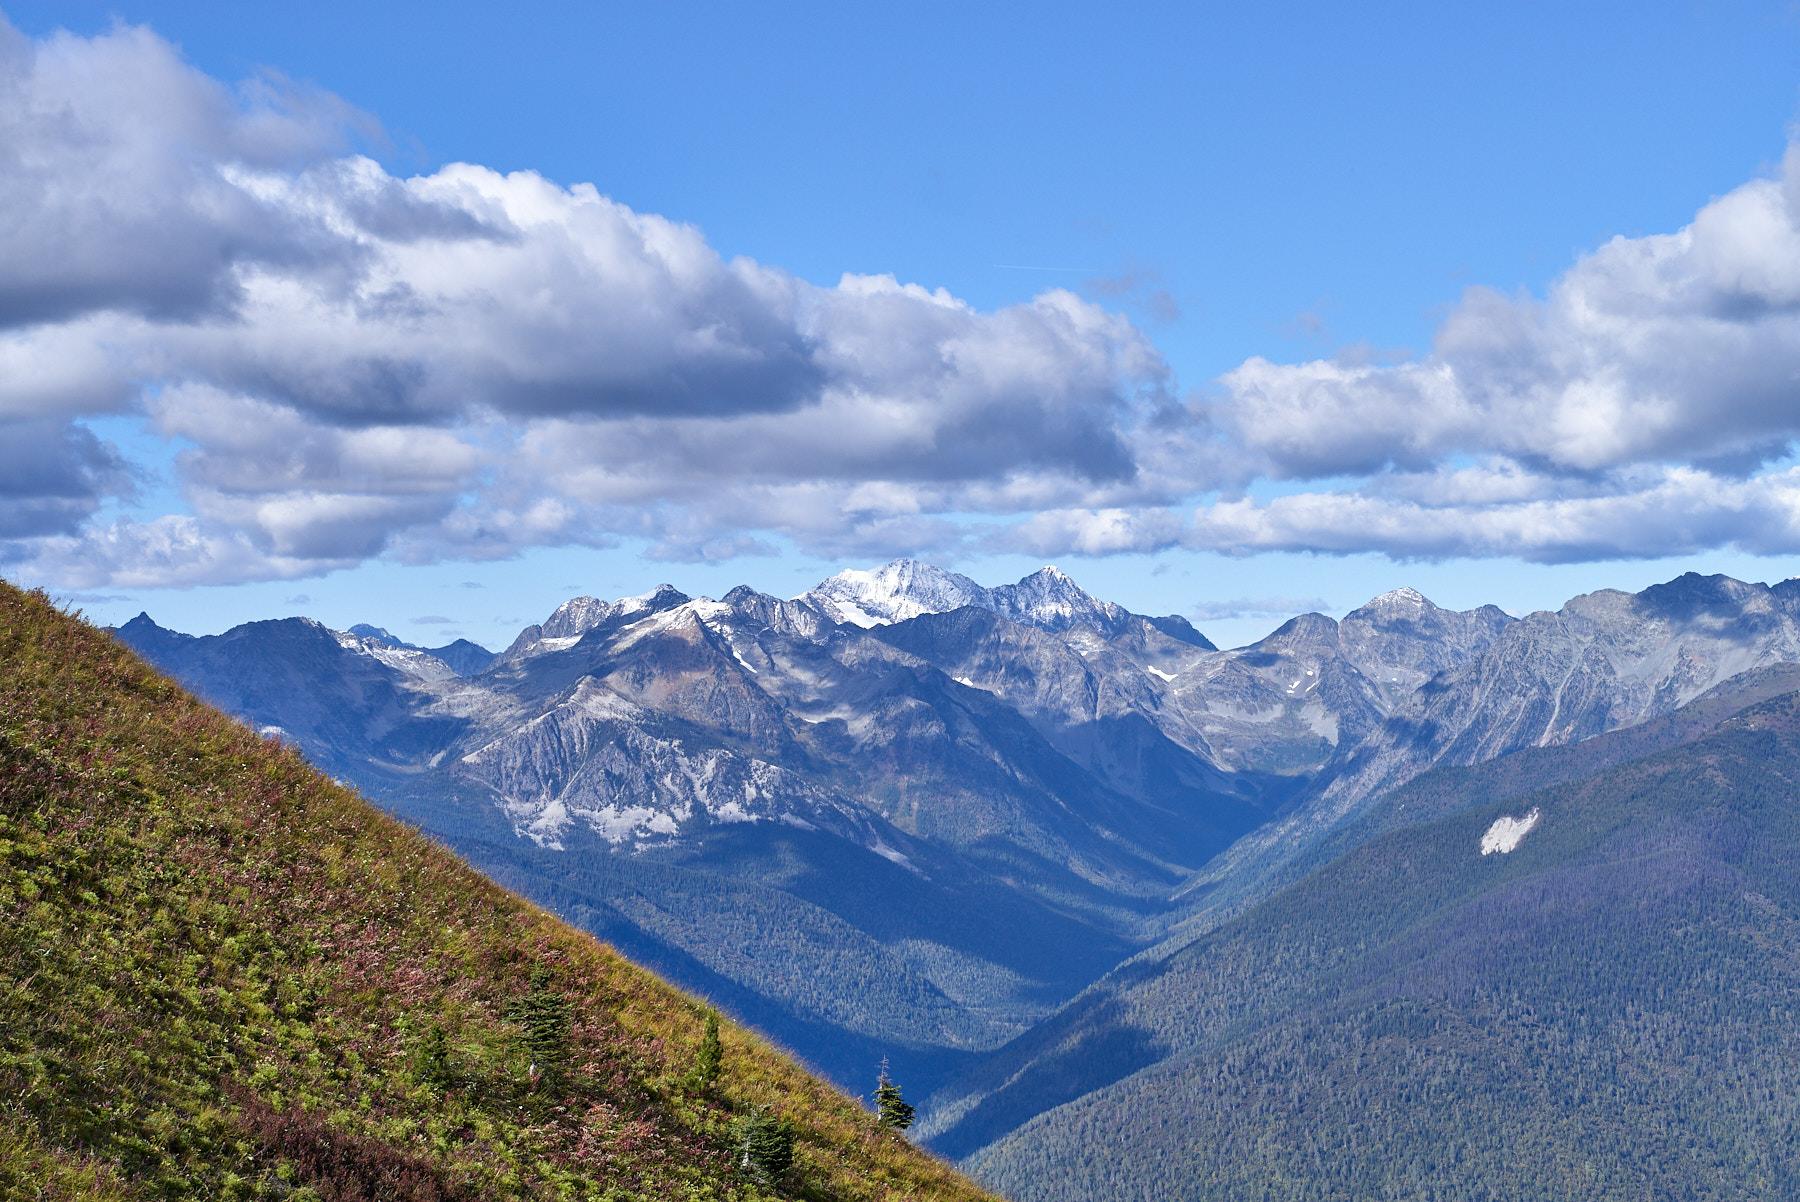 Views along hike to the Idaho Peak summit ©johncameron.ca